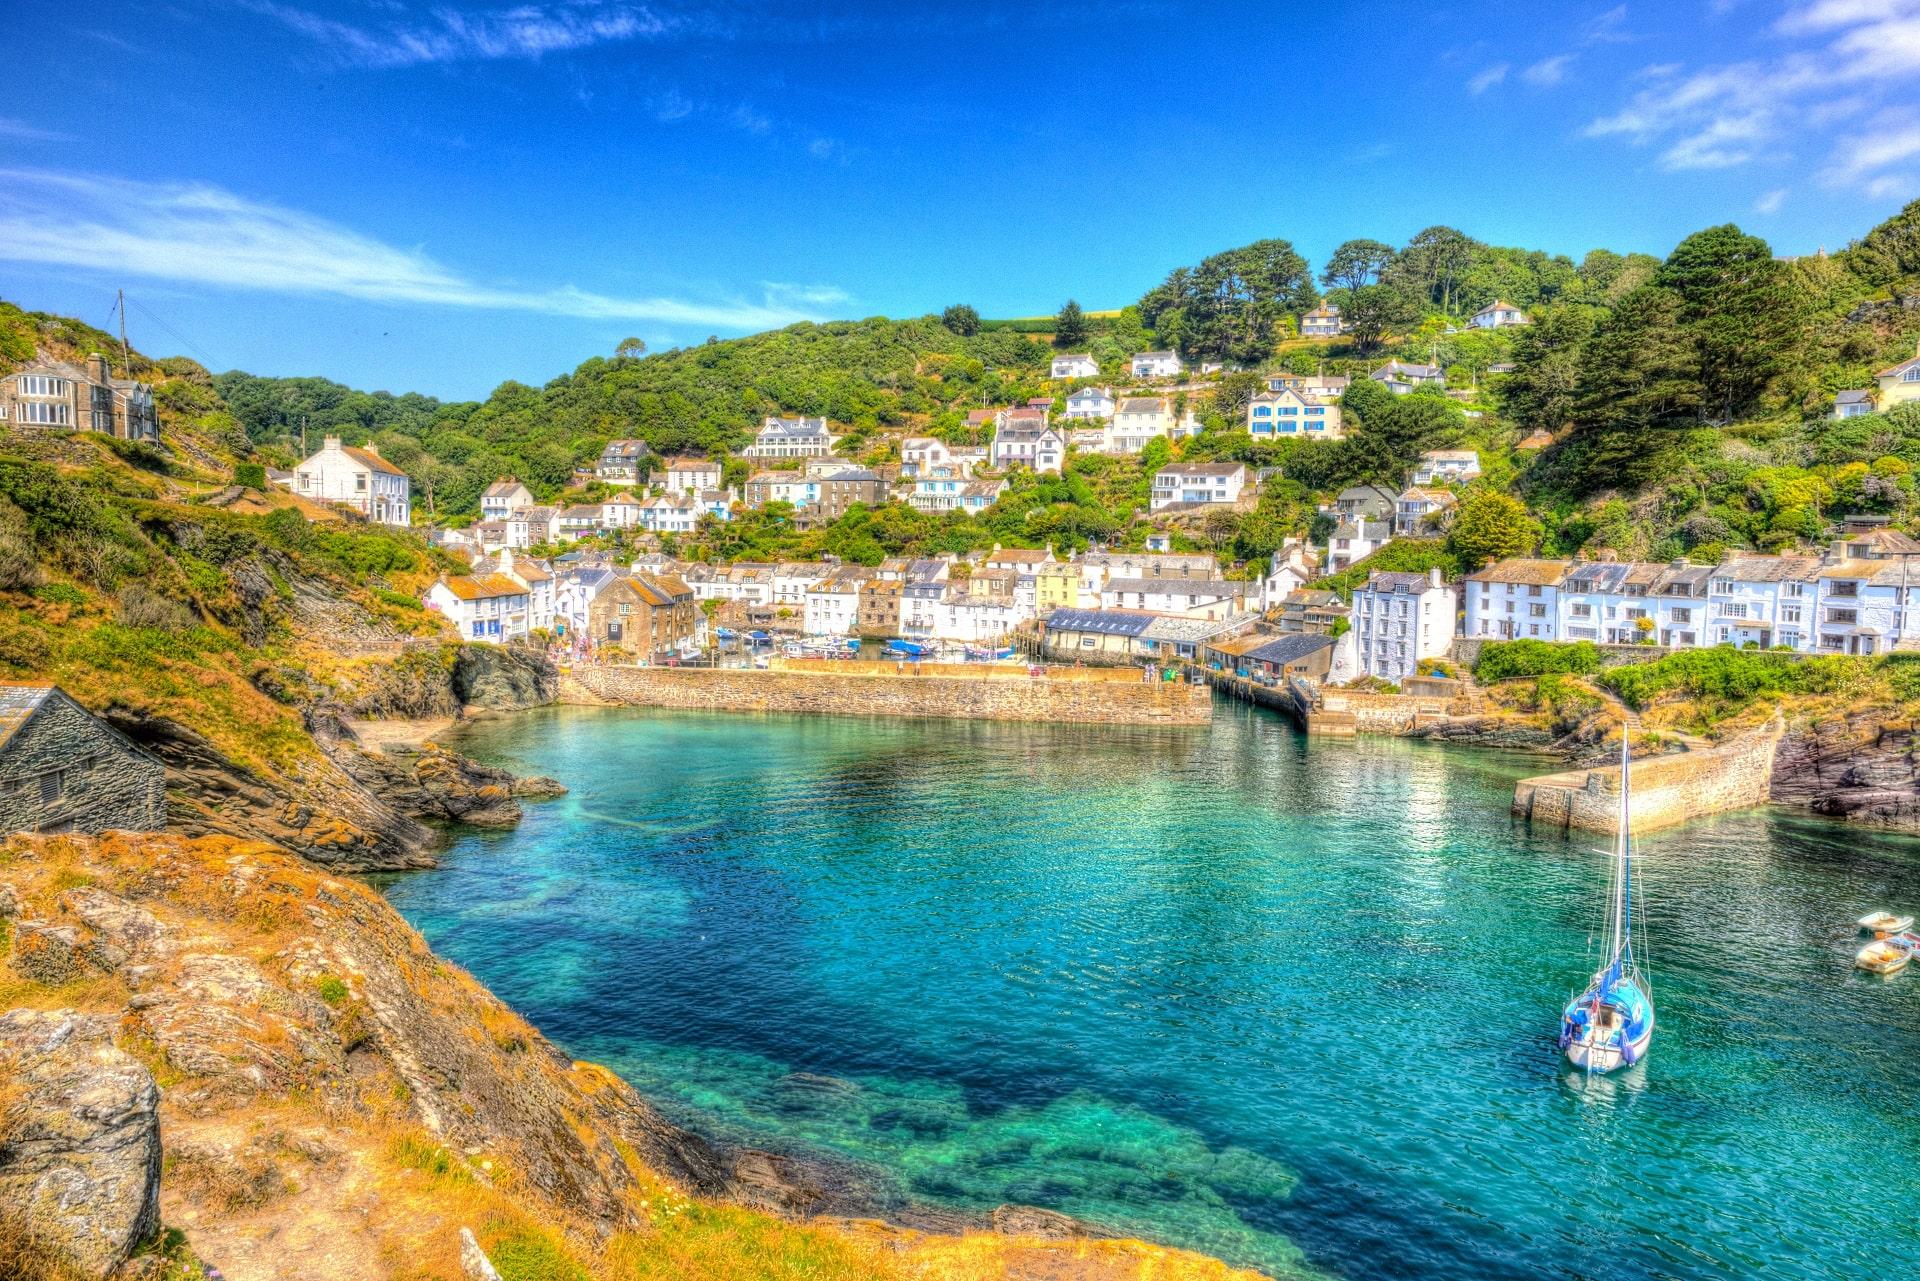 Cornwall_166676726